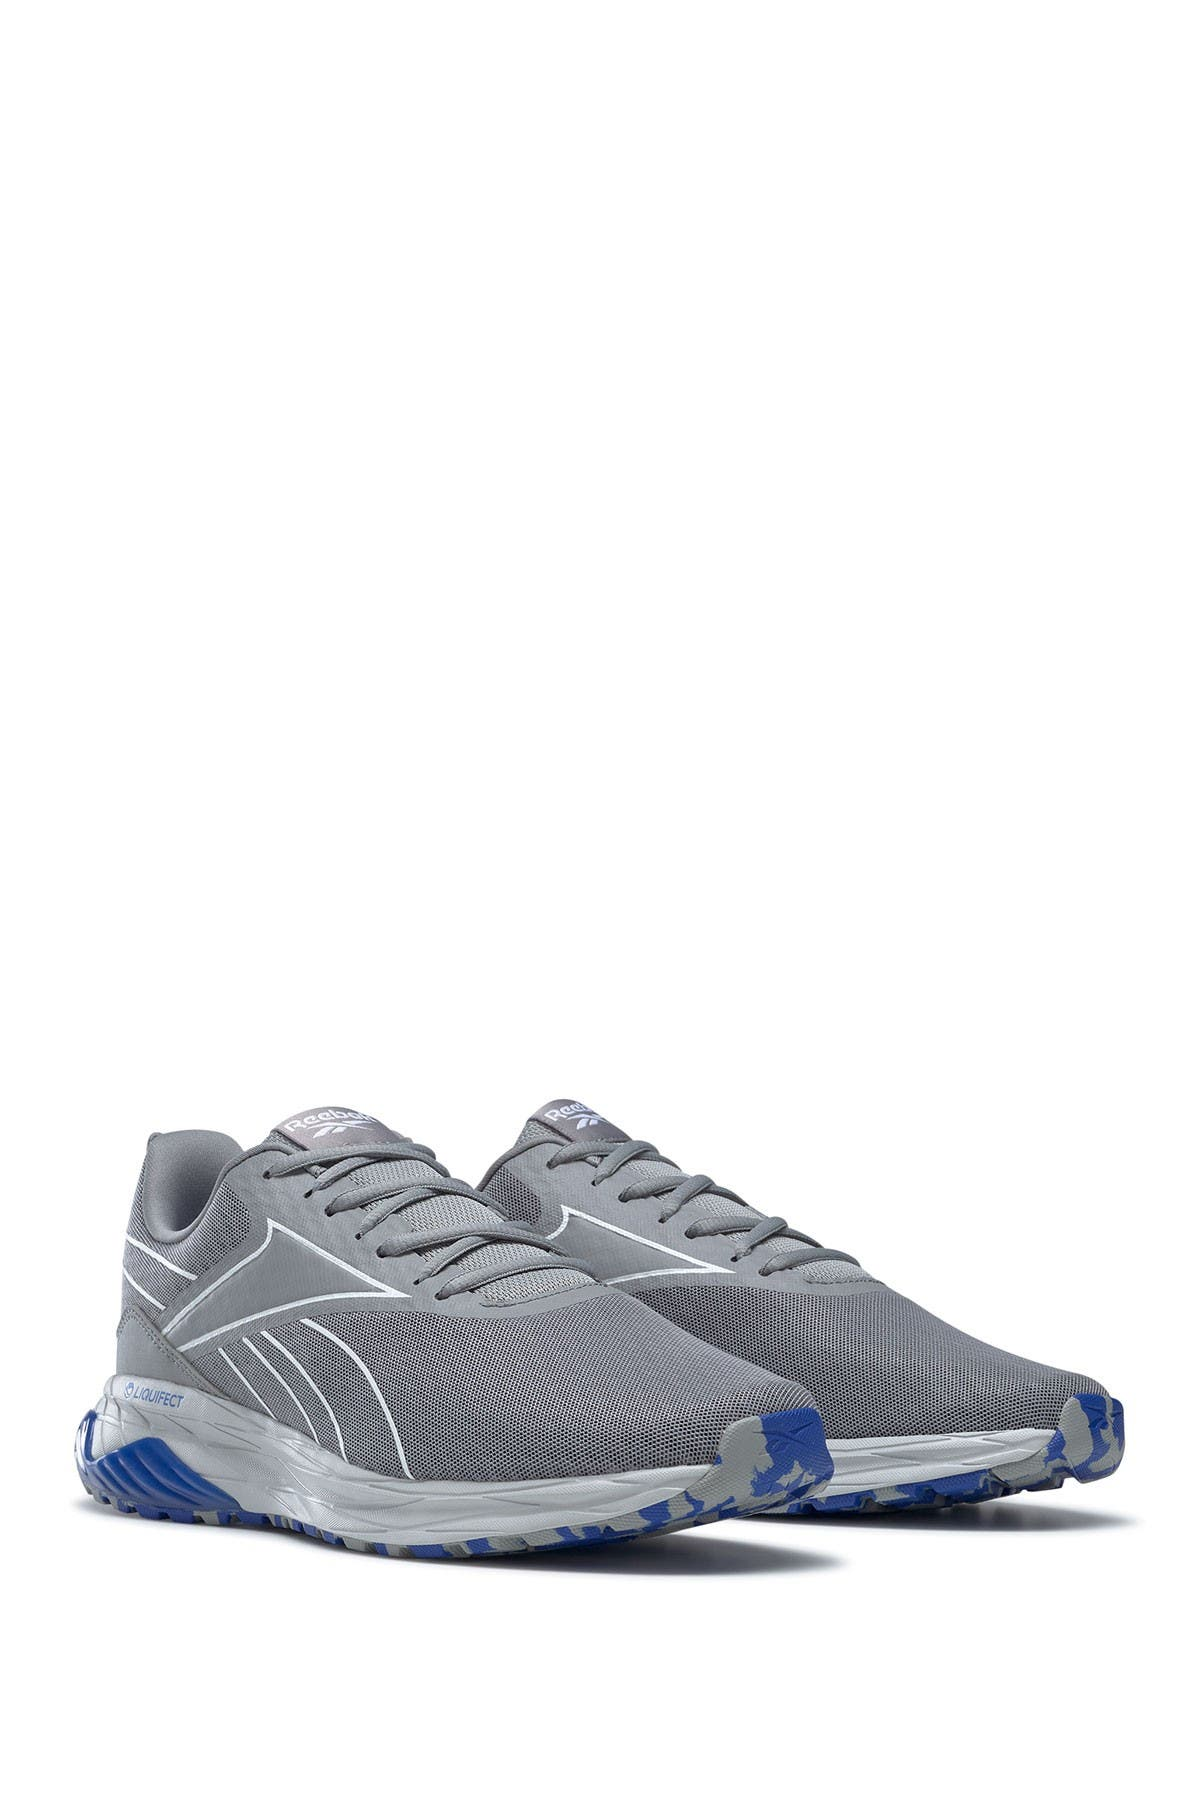 Image of Reebok Liquifect 180 2 Shoe